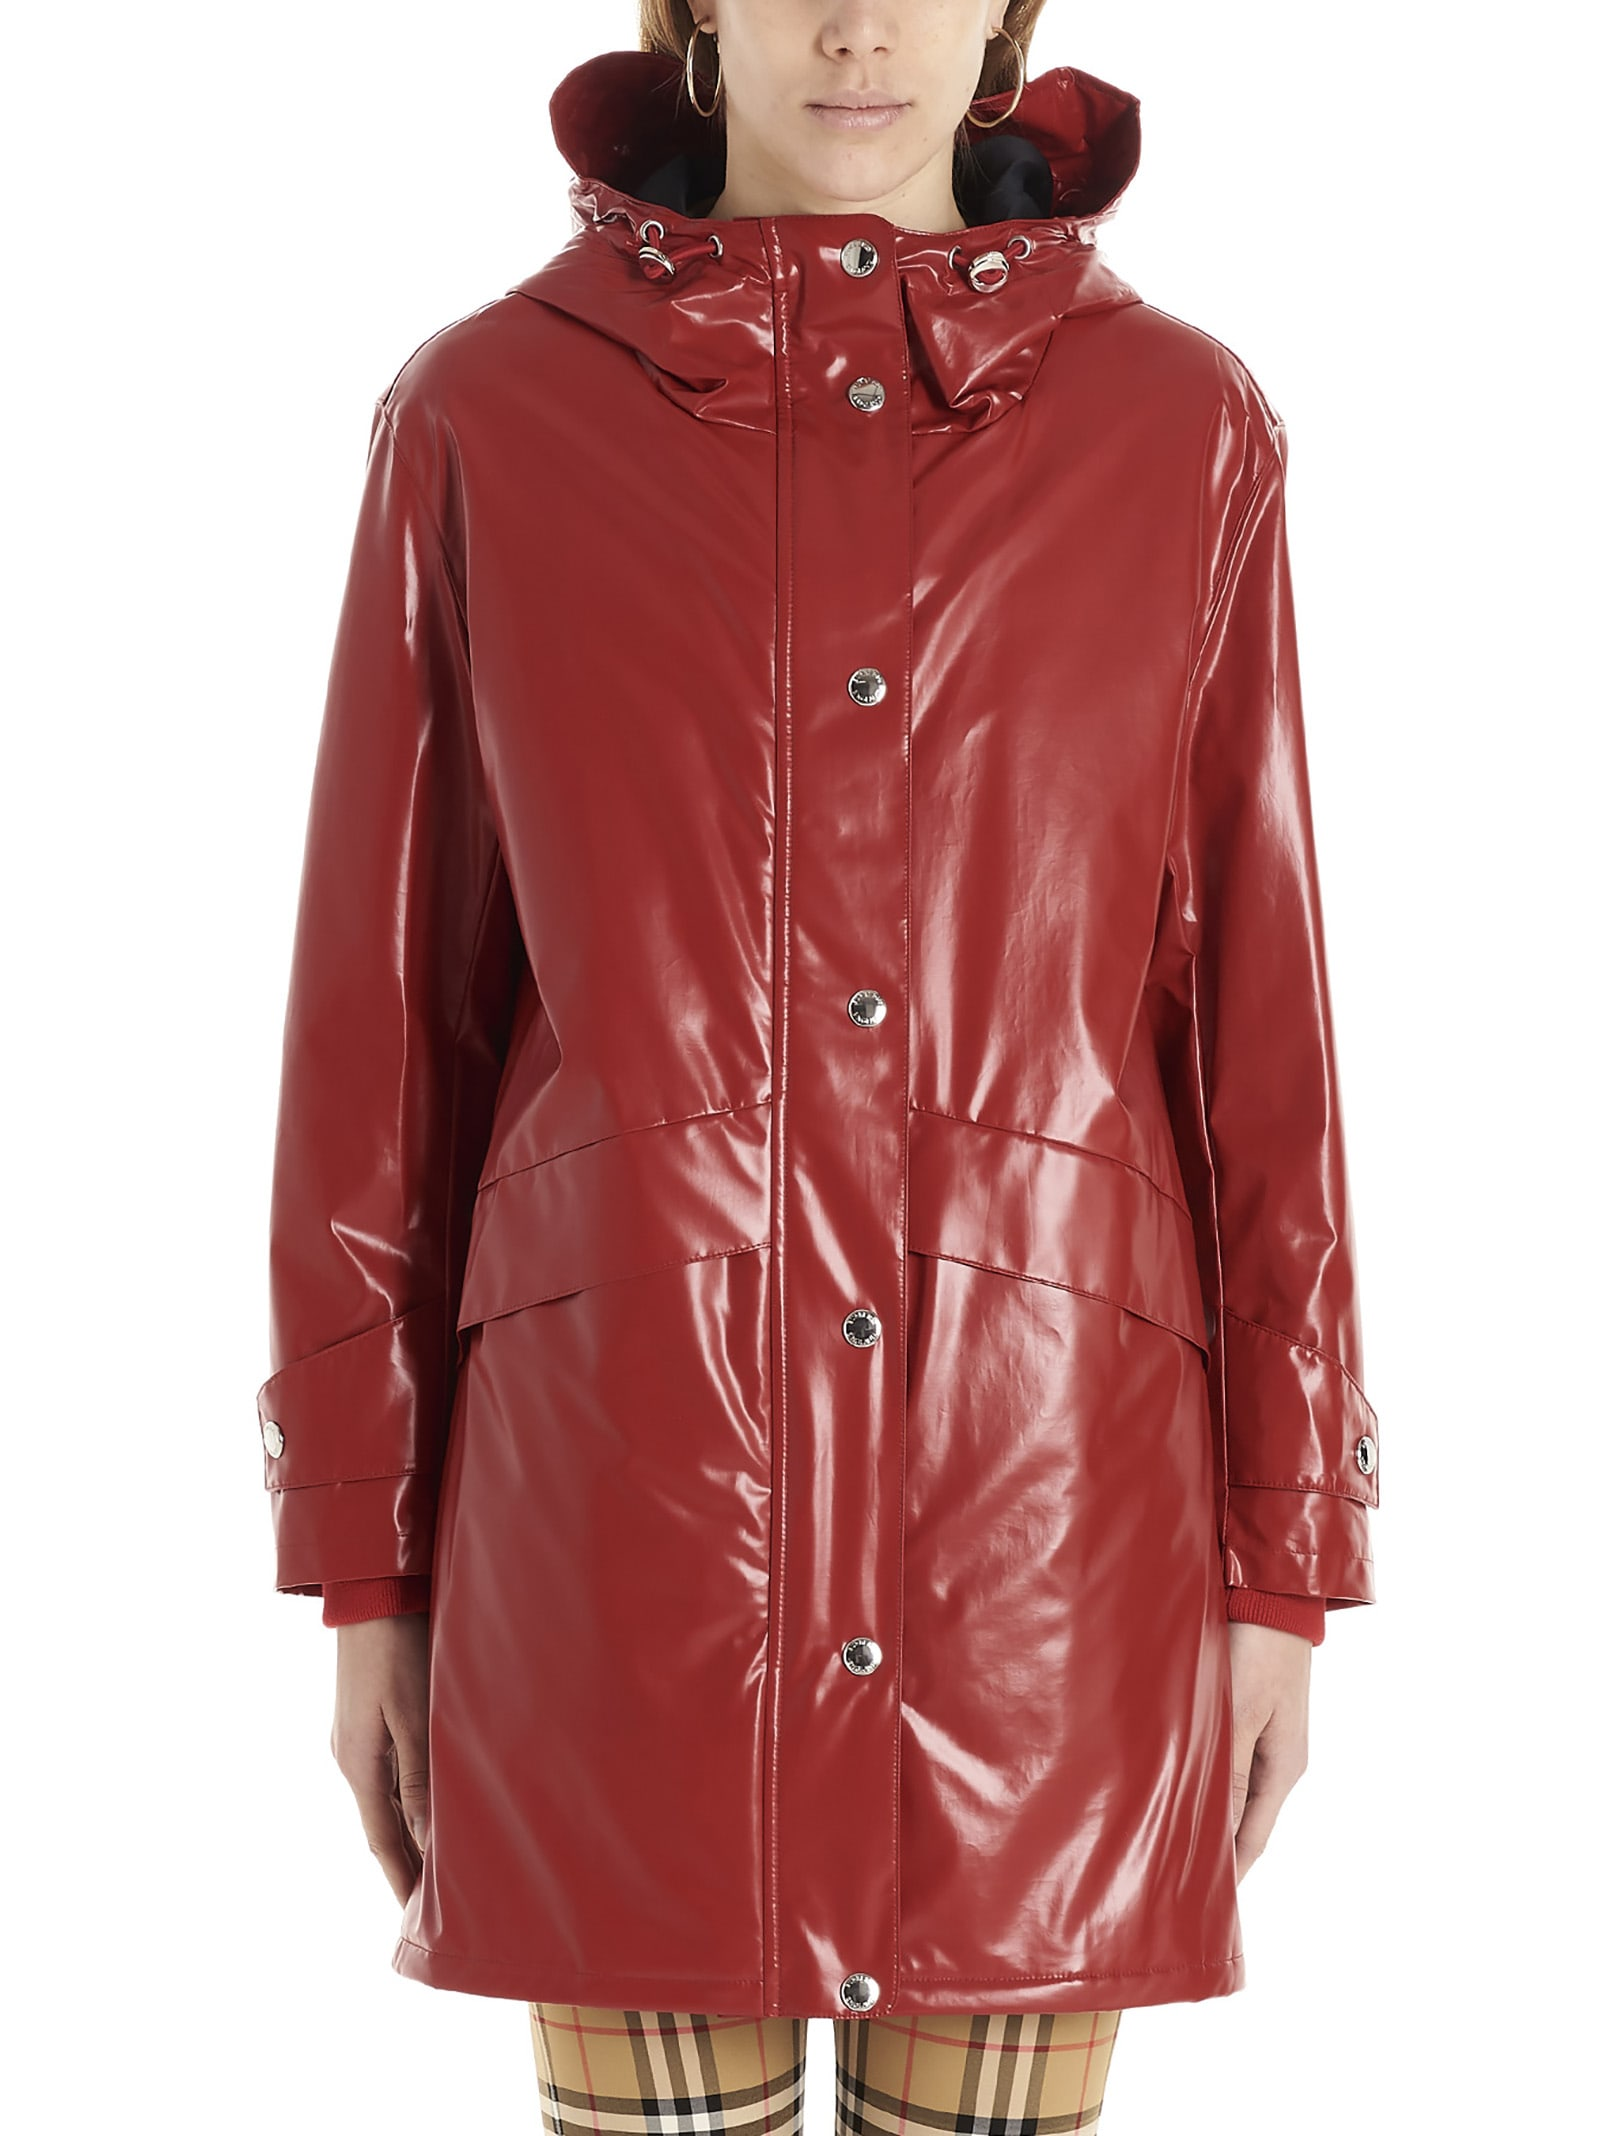 Burberry cramond Raincoat